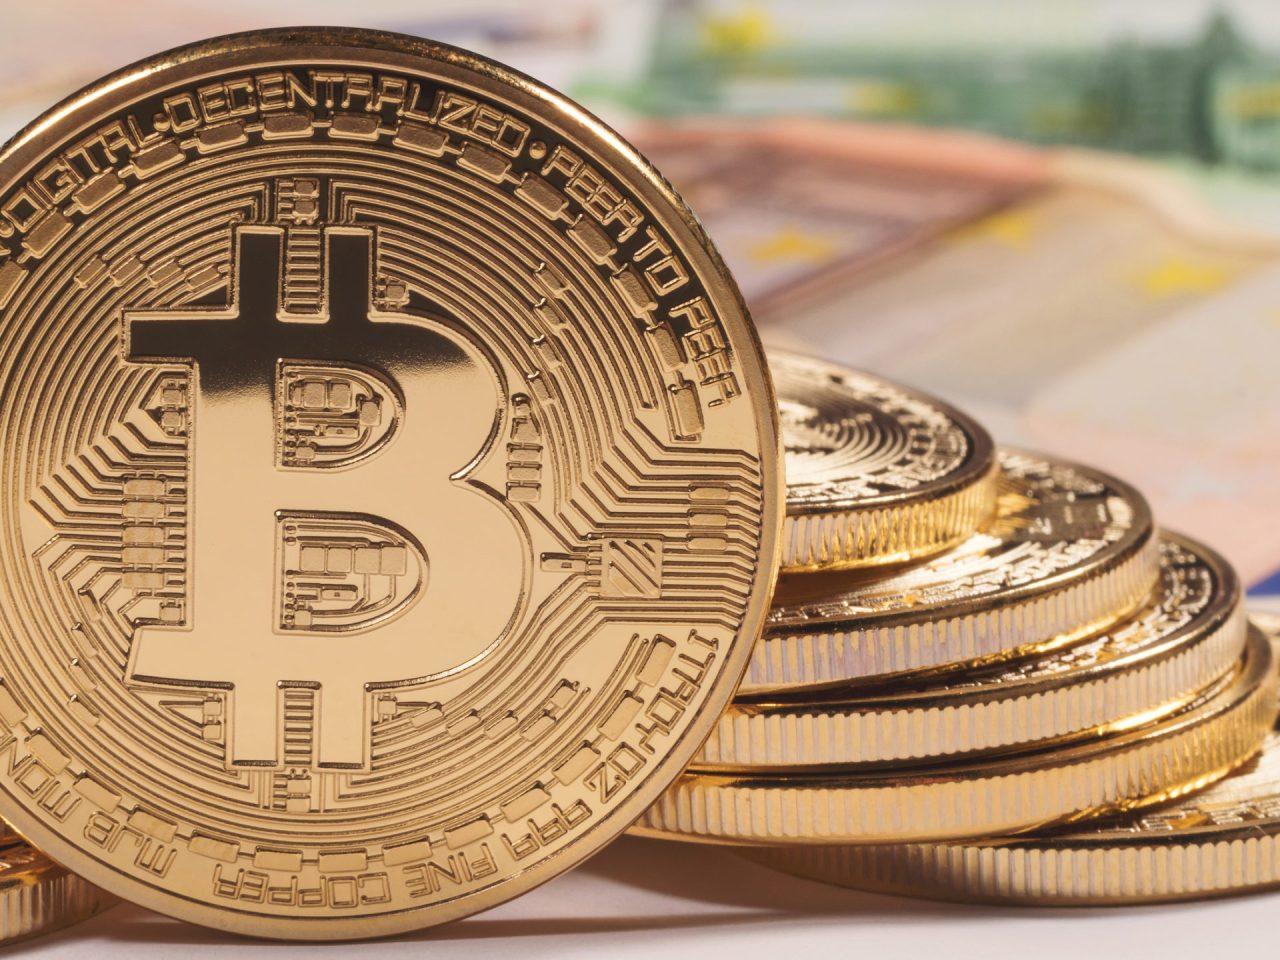 uk taxman reviews treatment of bitcoins